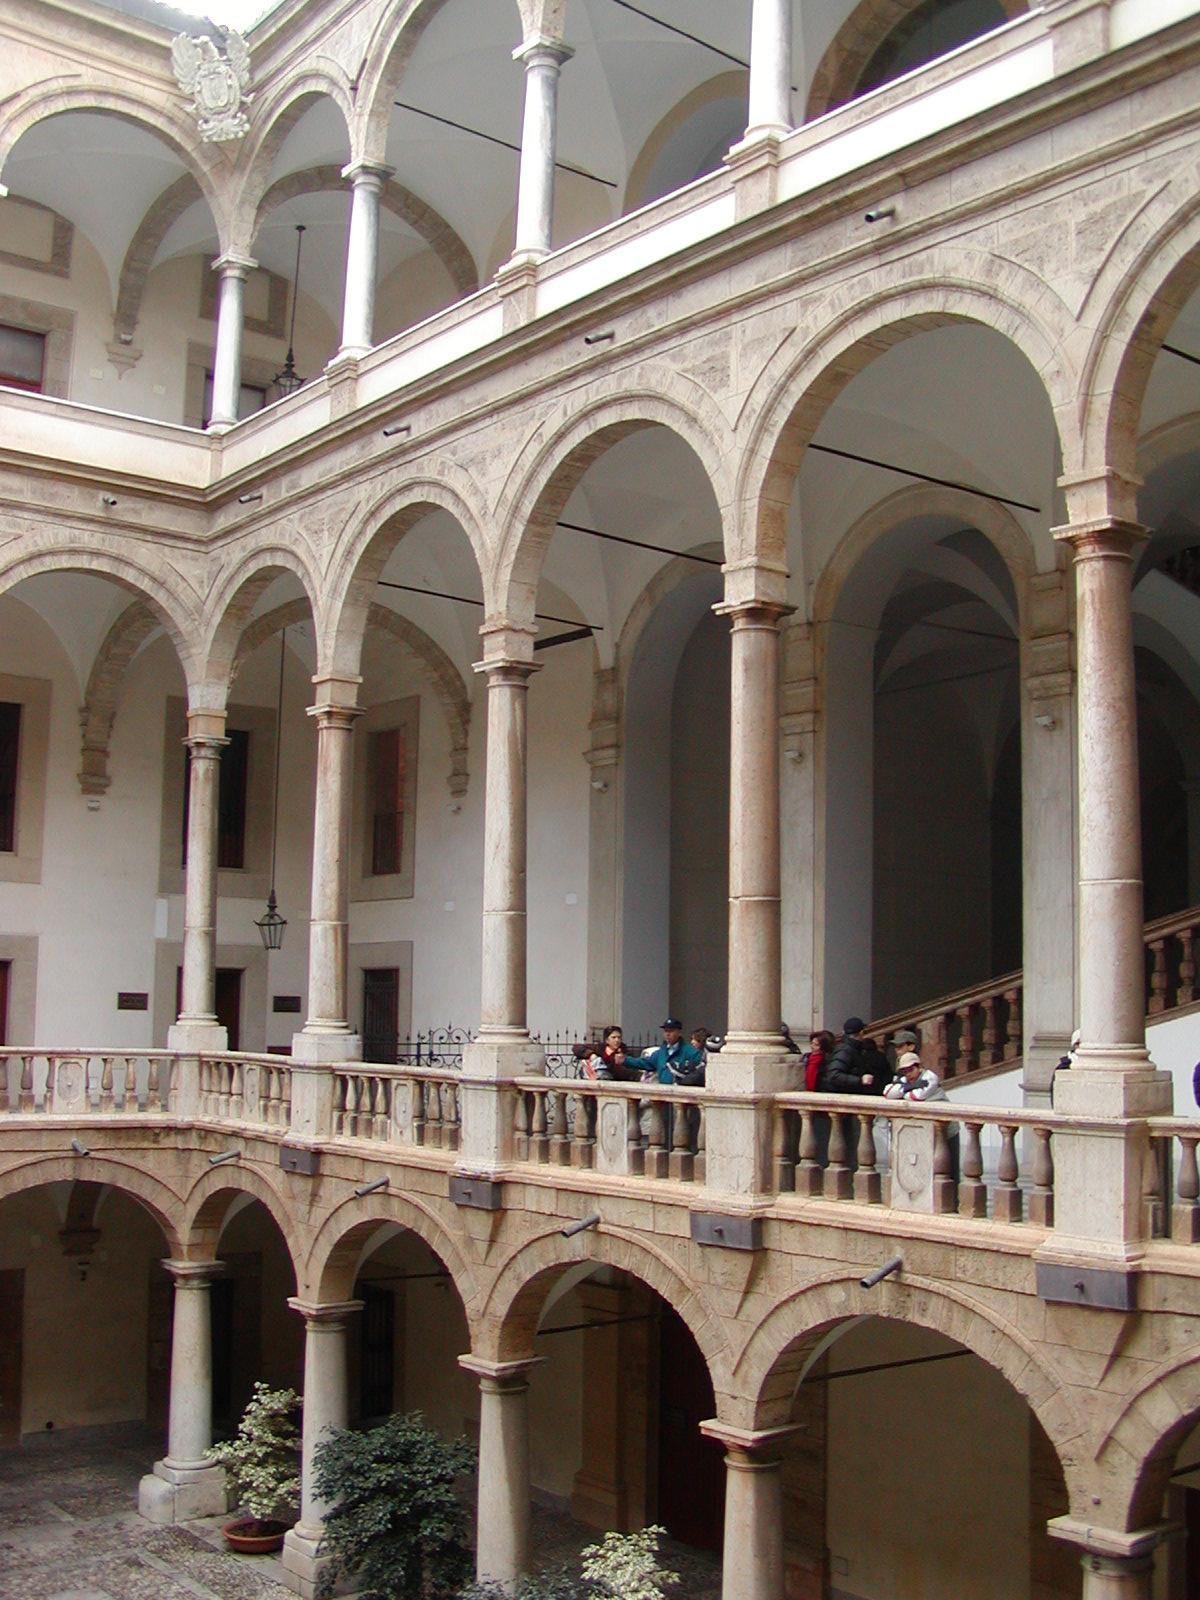 Norman Palace - 2004-01-04-121618